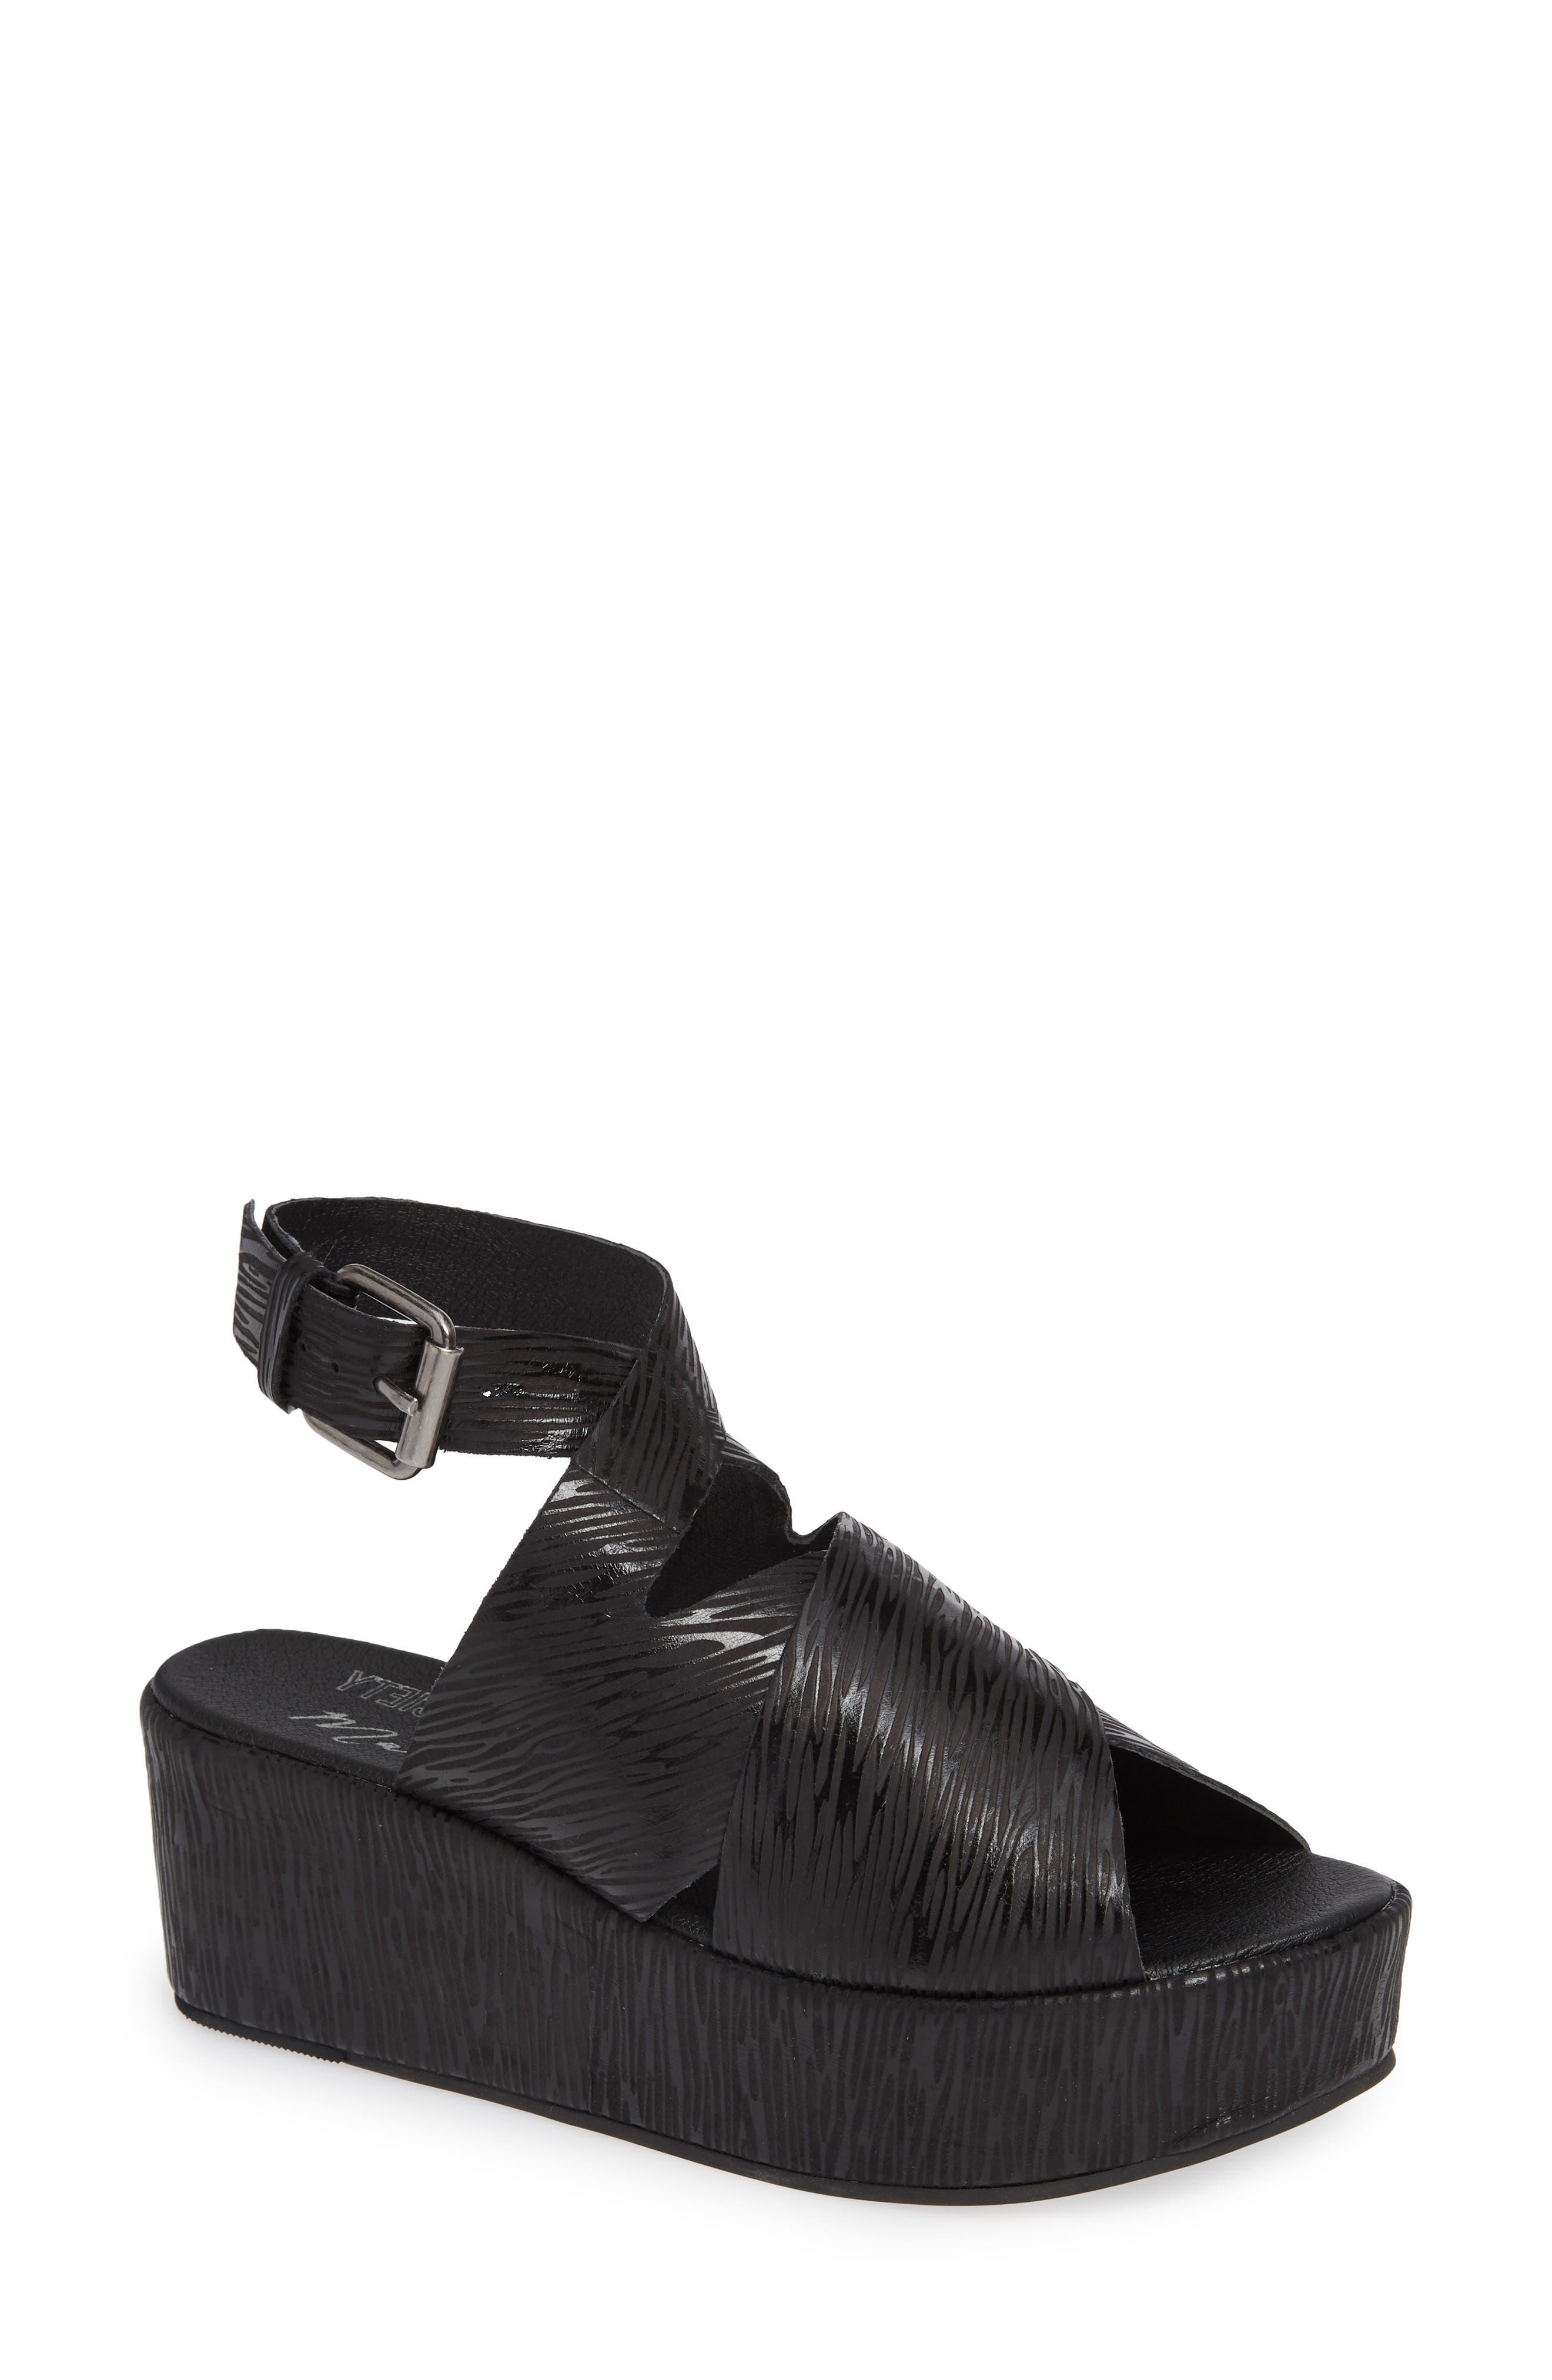 Runway Wedge Sandal,                         Main,                         color, Black Lizard Print Leather